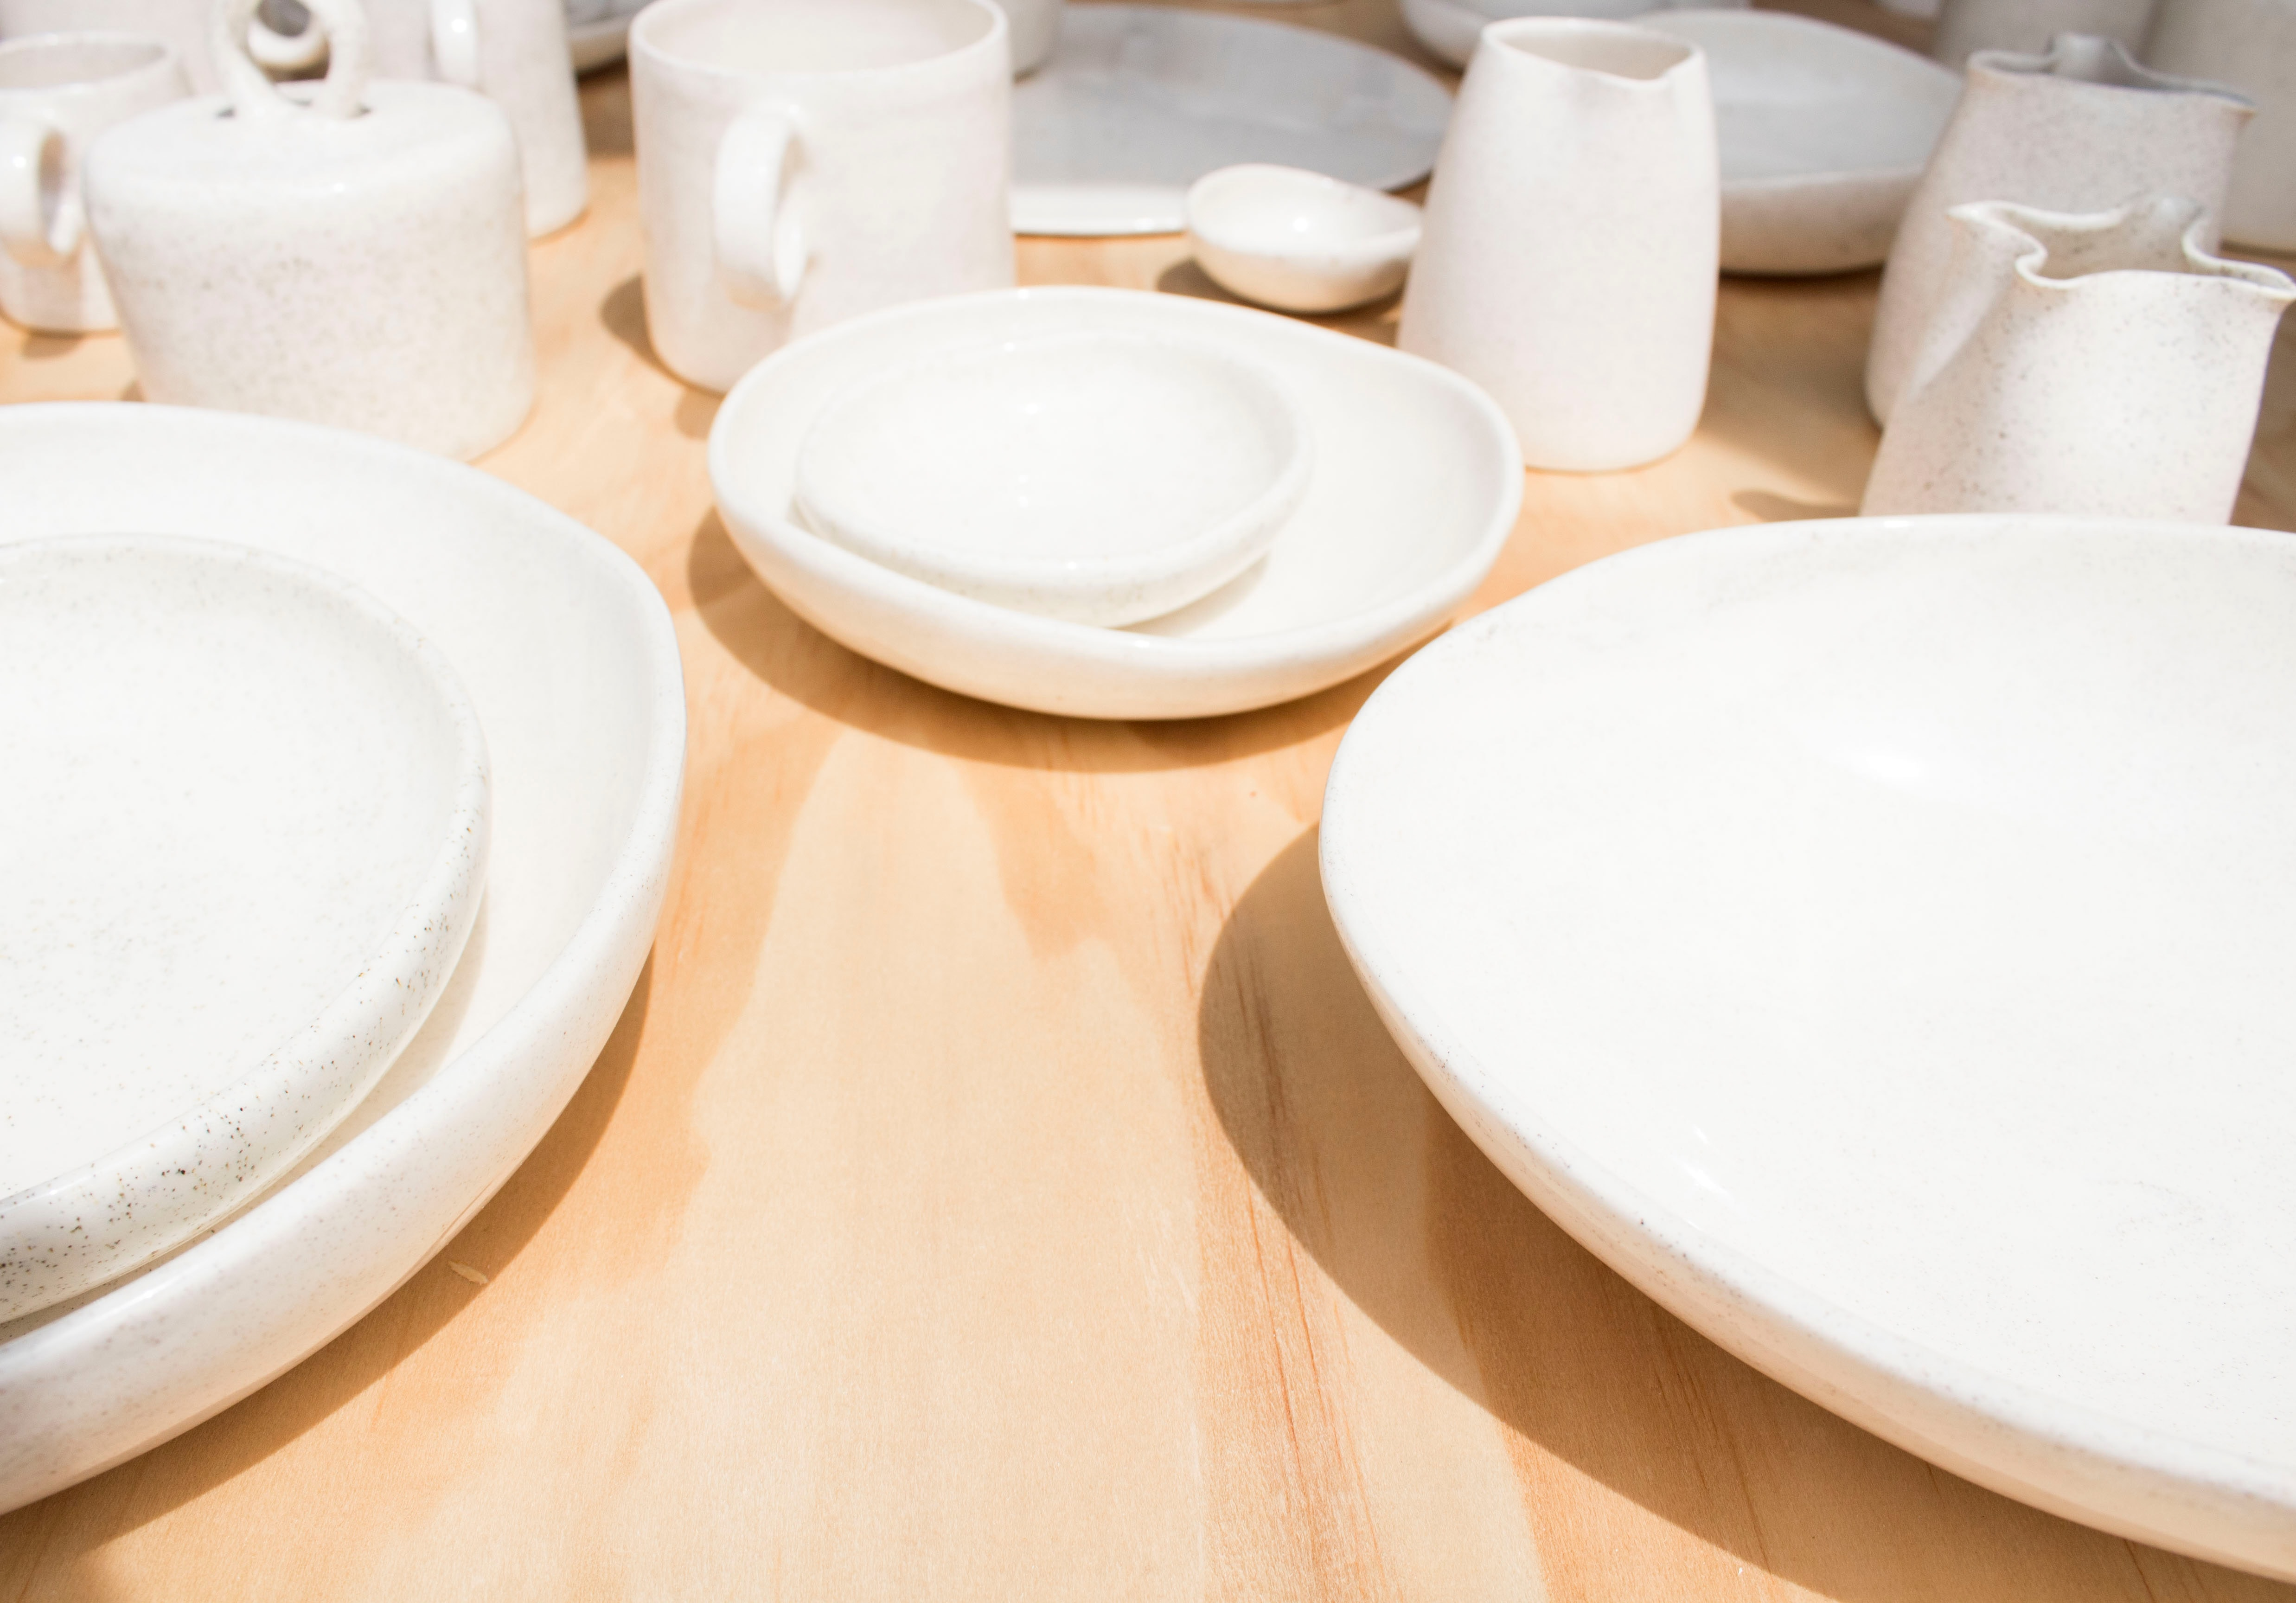 decorative white plates